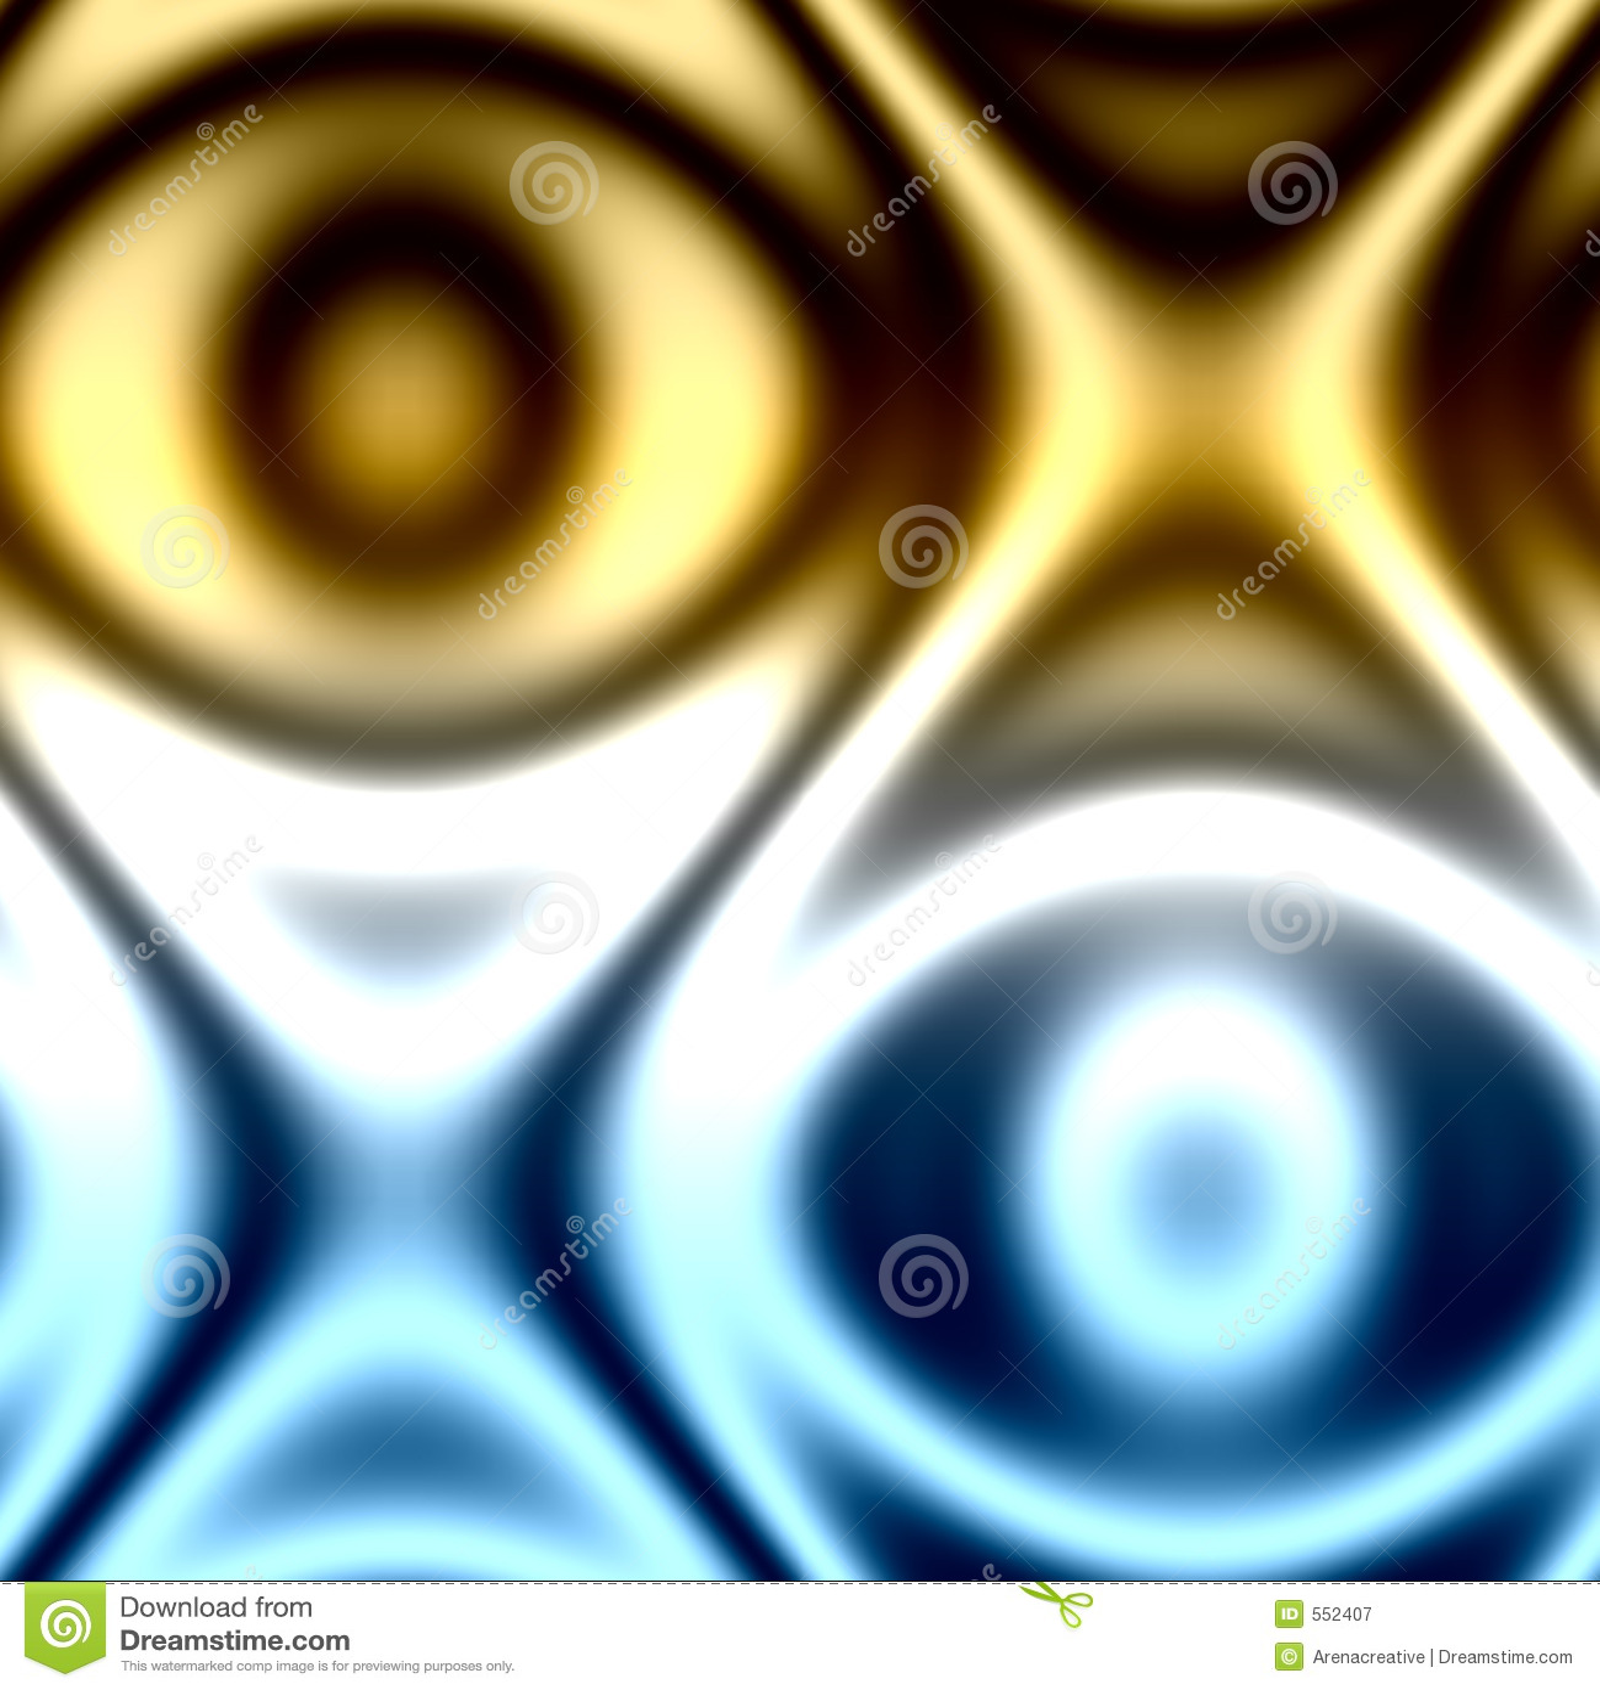 Abstract Opposite Eyes Stock Illustration. Illustration Of